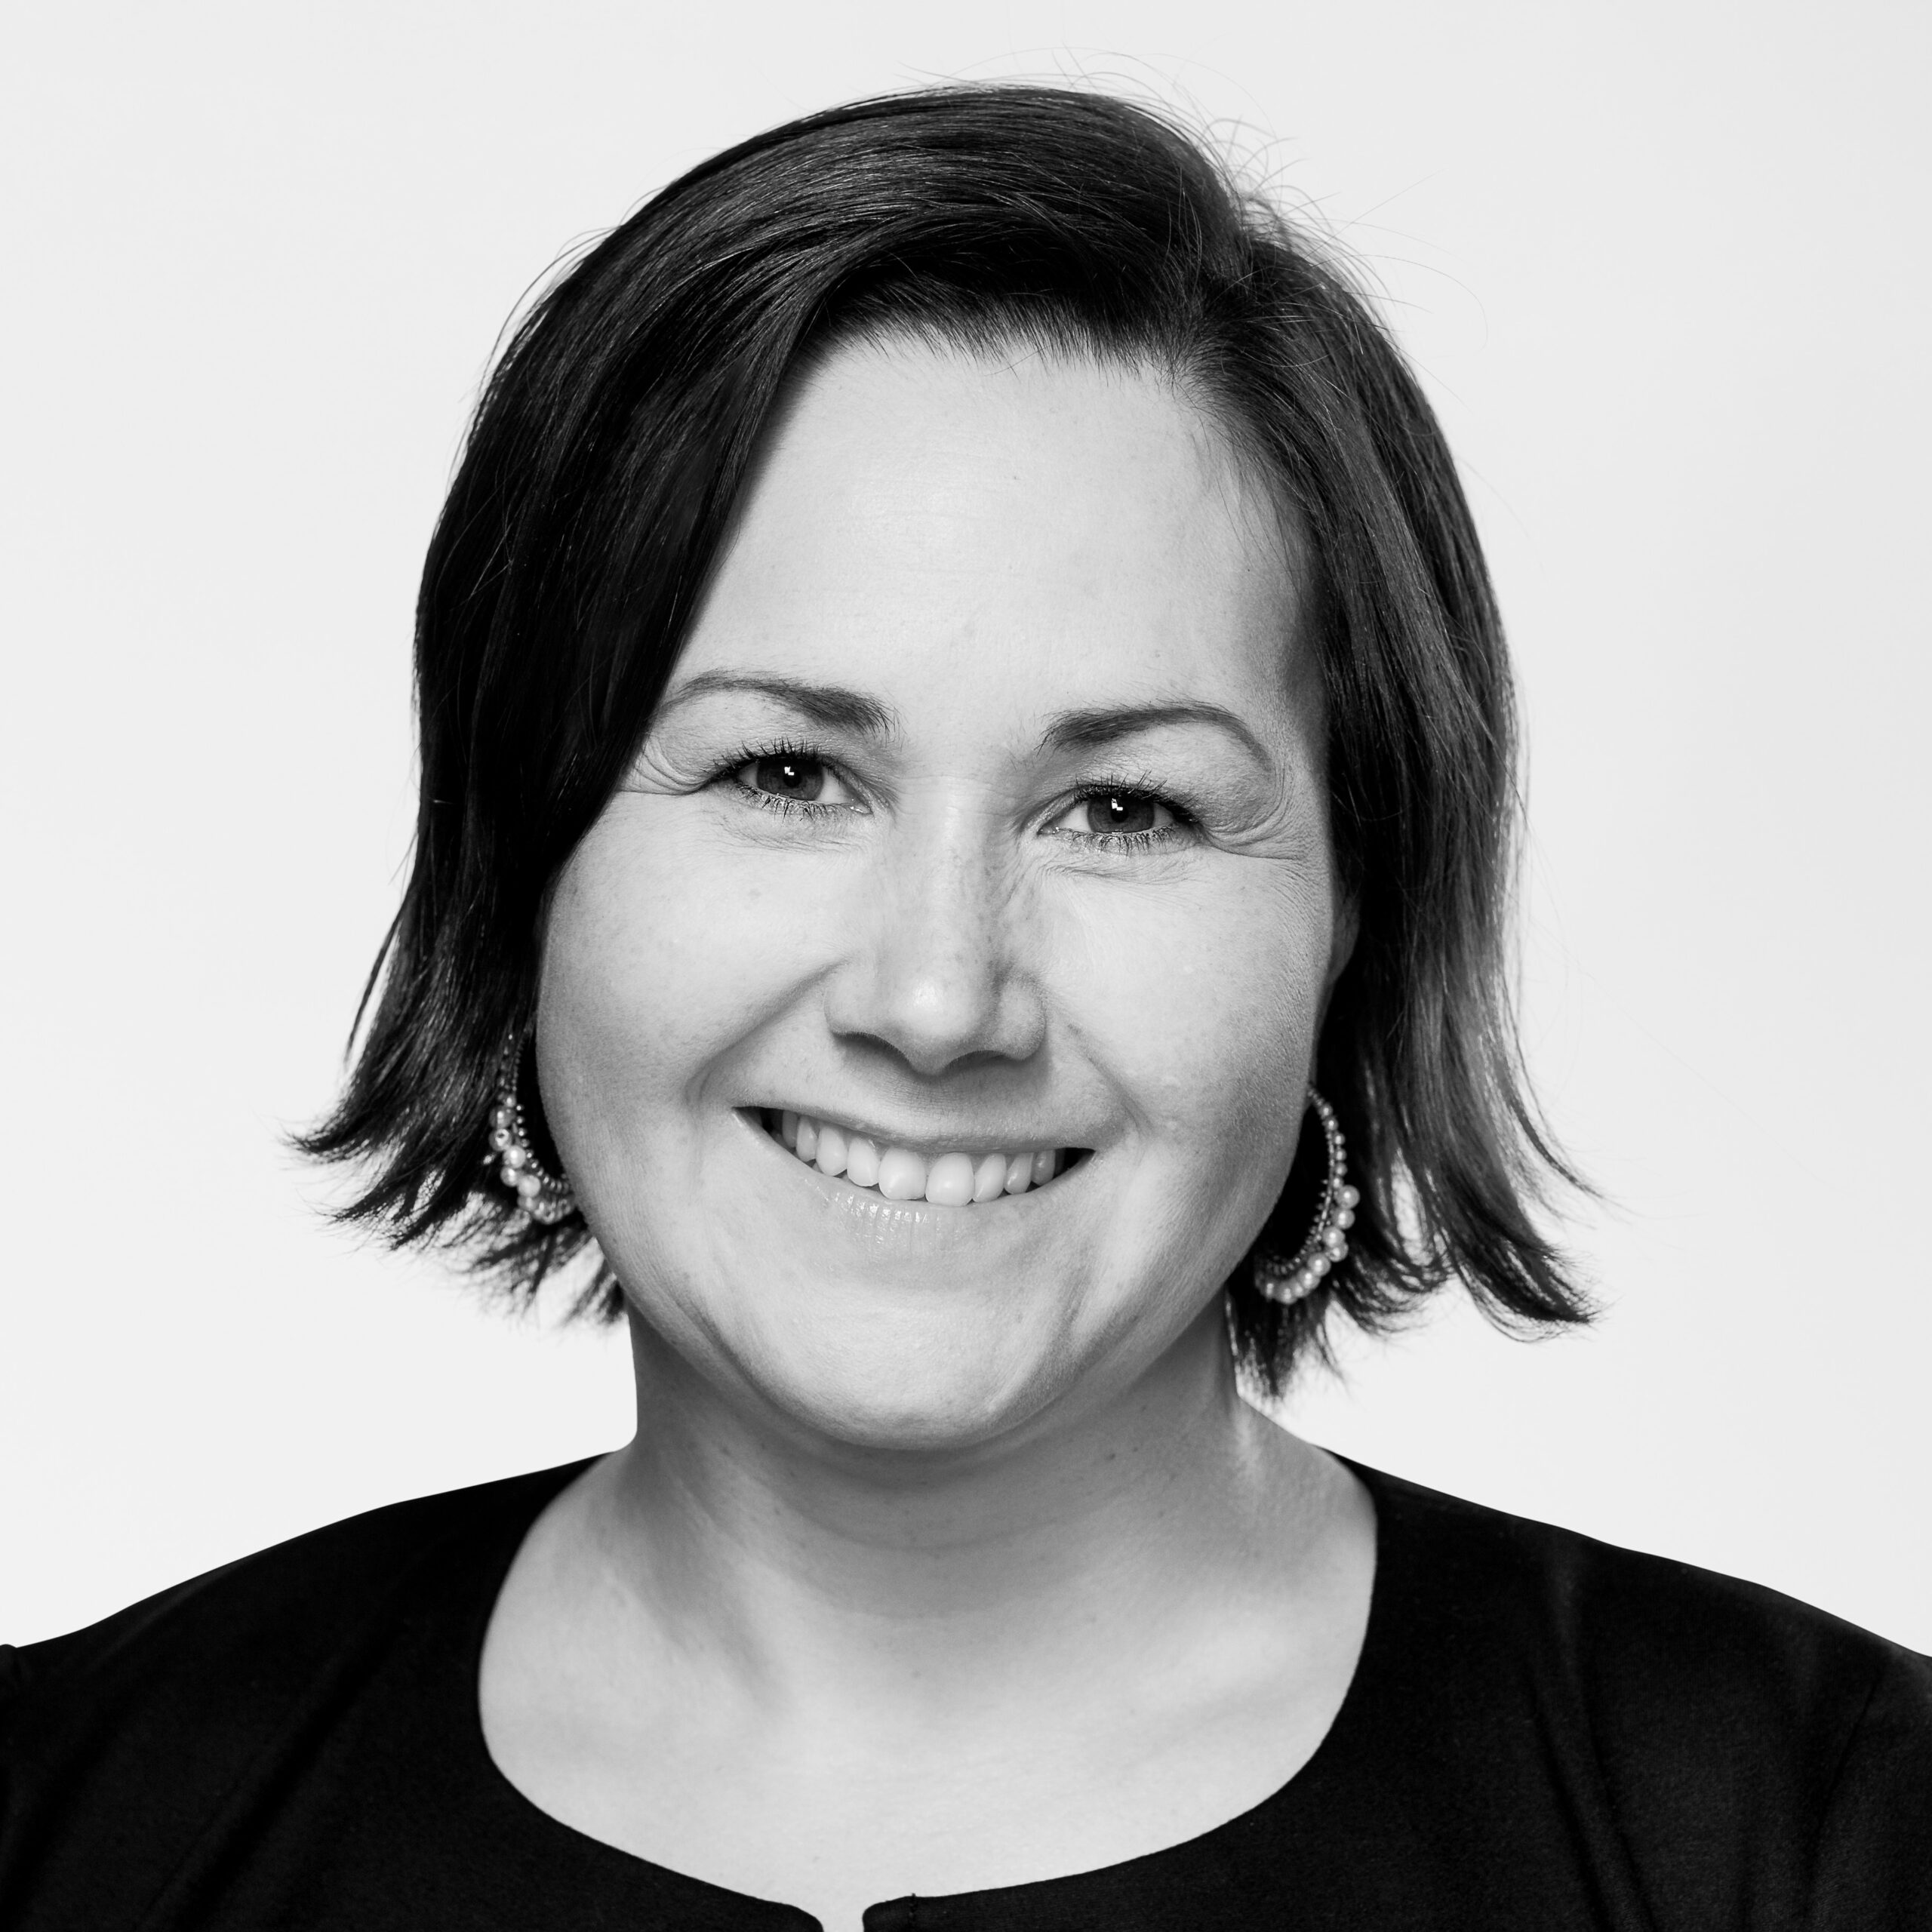 Ms. Aaja Chemnitz Larsen